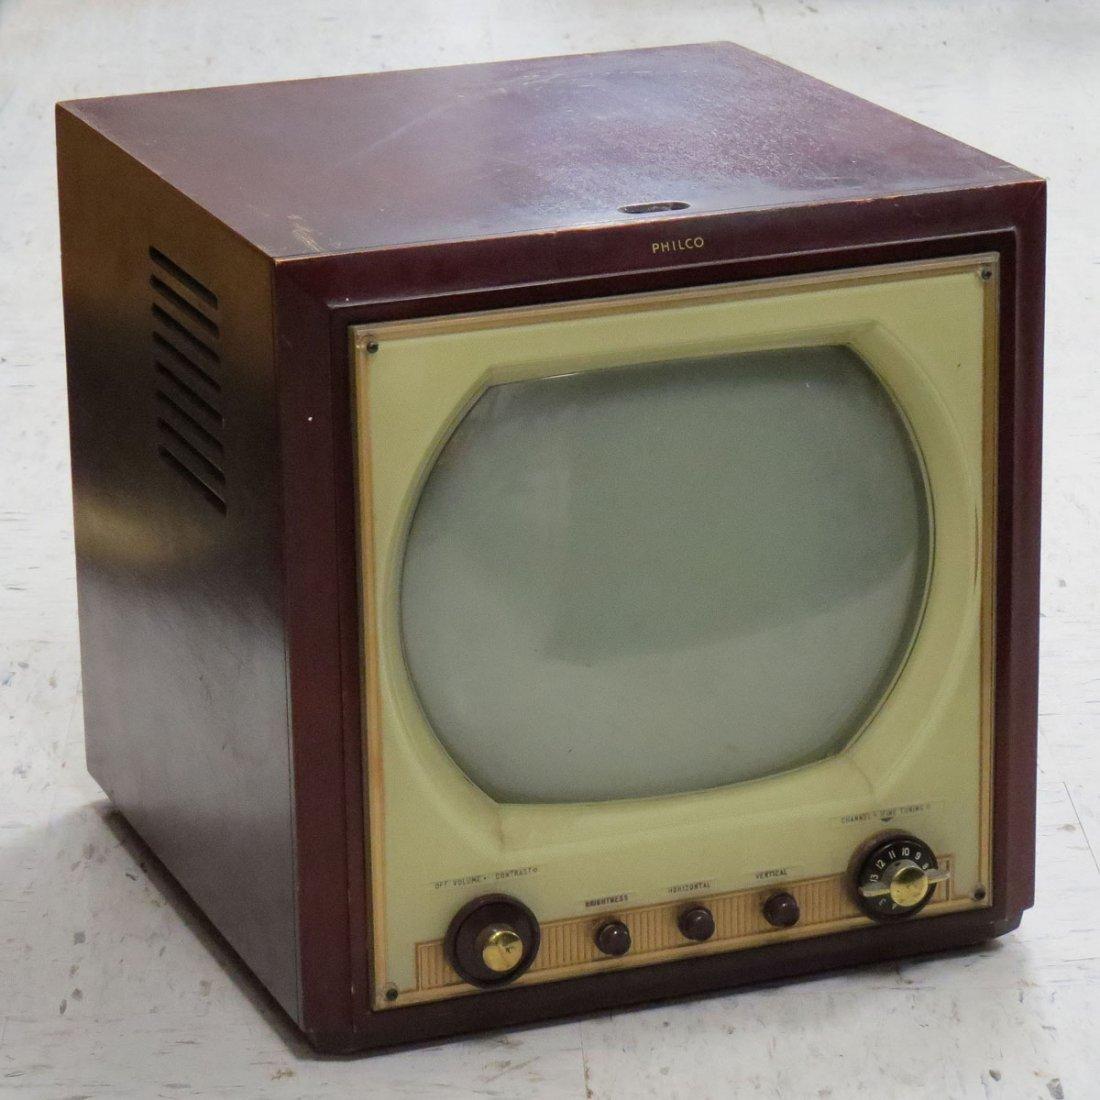 "VINTAGE PHILCO 12"" MODEL 51-PT 1208 TELEVISION"